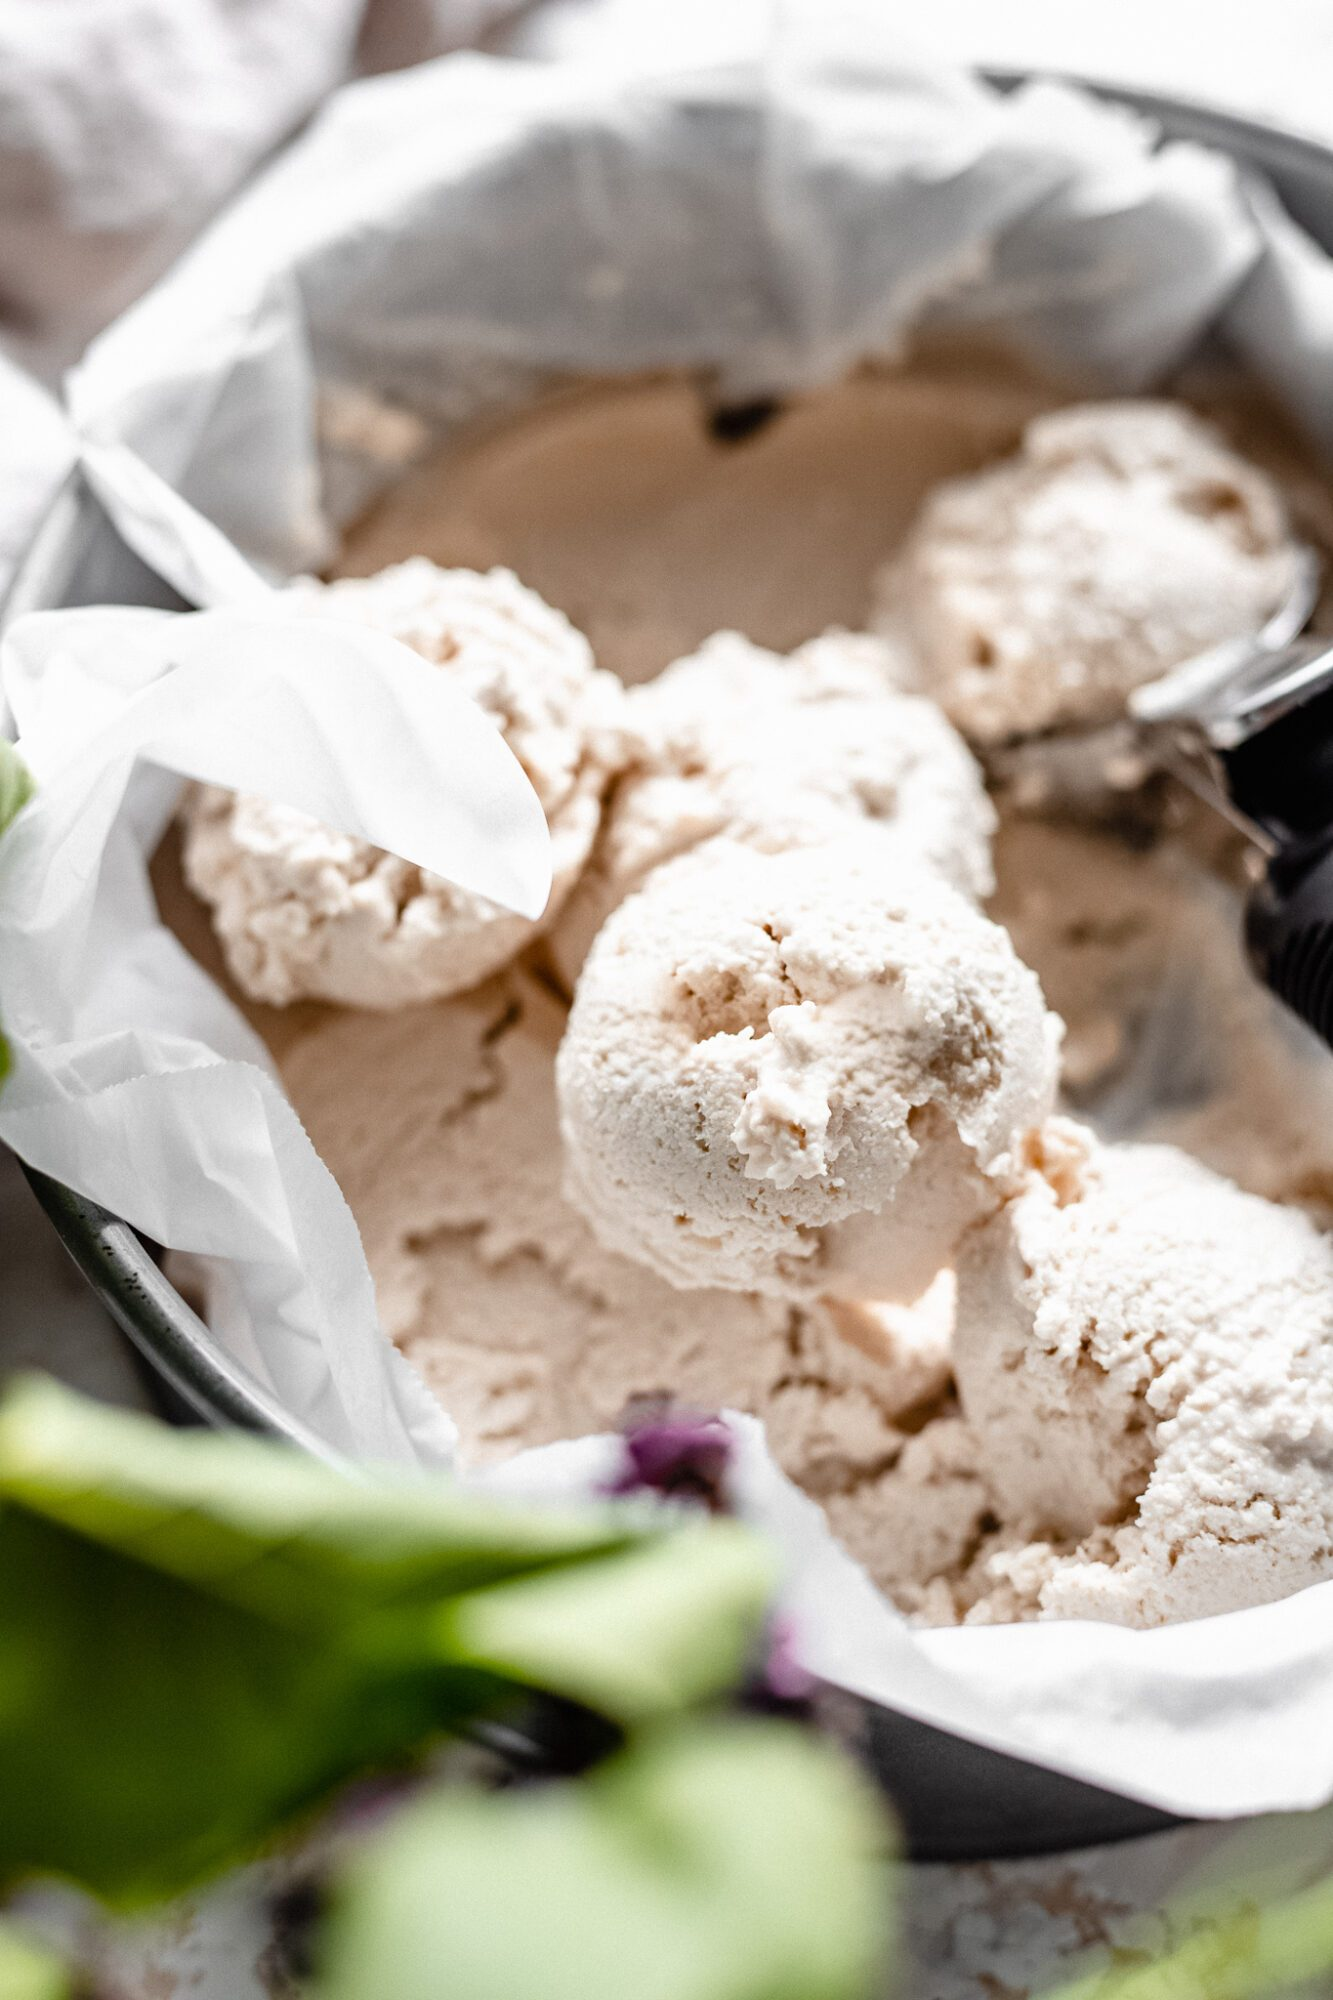 scoops of vegan cashew ice cream